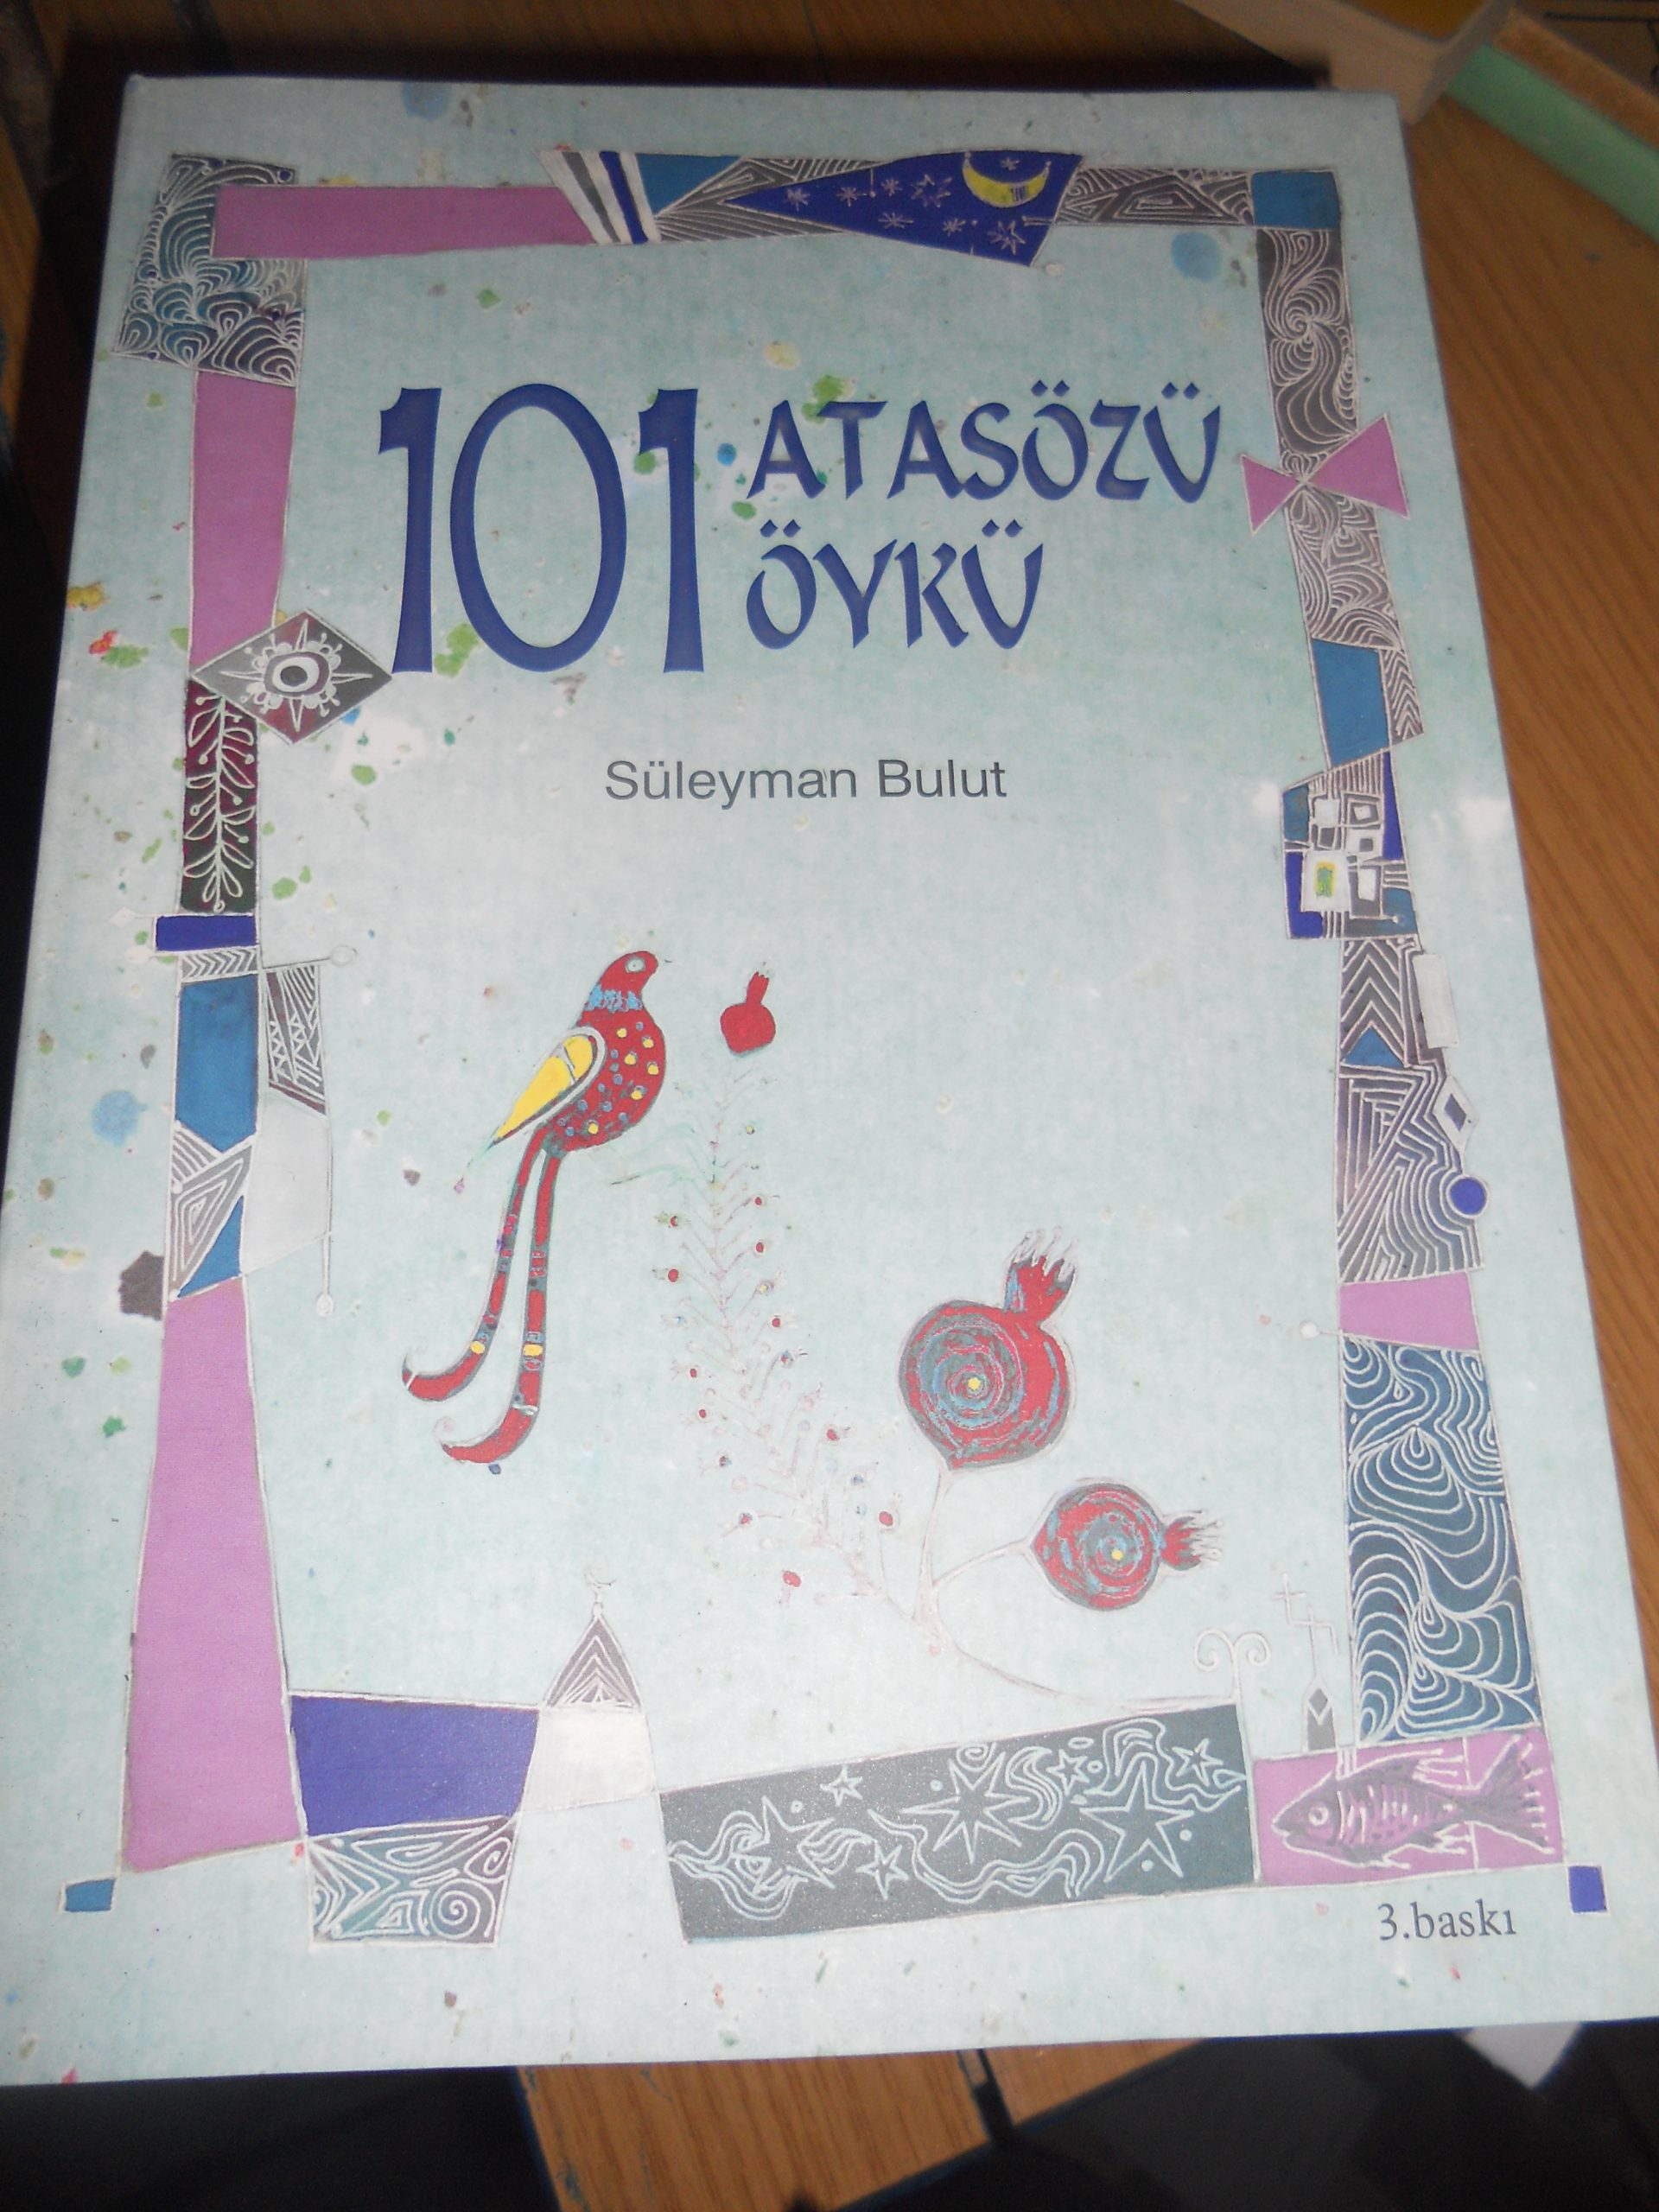 101 ATASÖZÜ 101 ÖYKÜ ve 101 DEYİM 101 ÖYKÜ(İki kitap)/ Süleyman BULUT/Toplam 25 TL